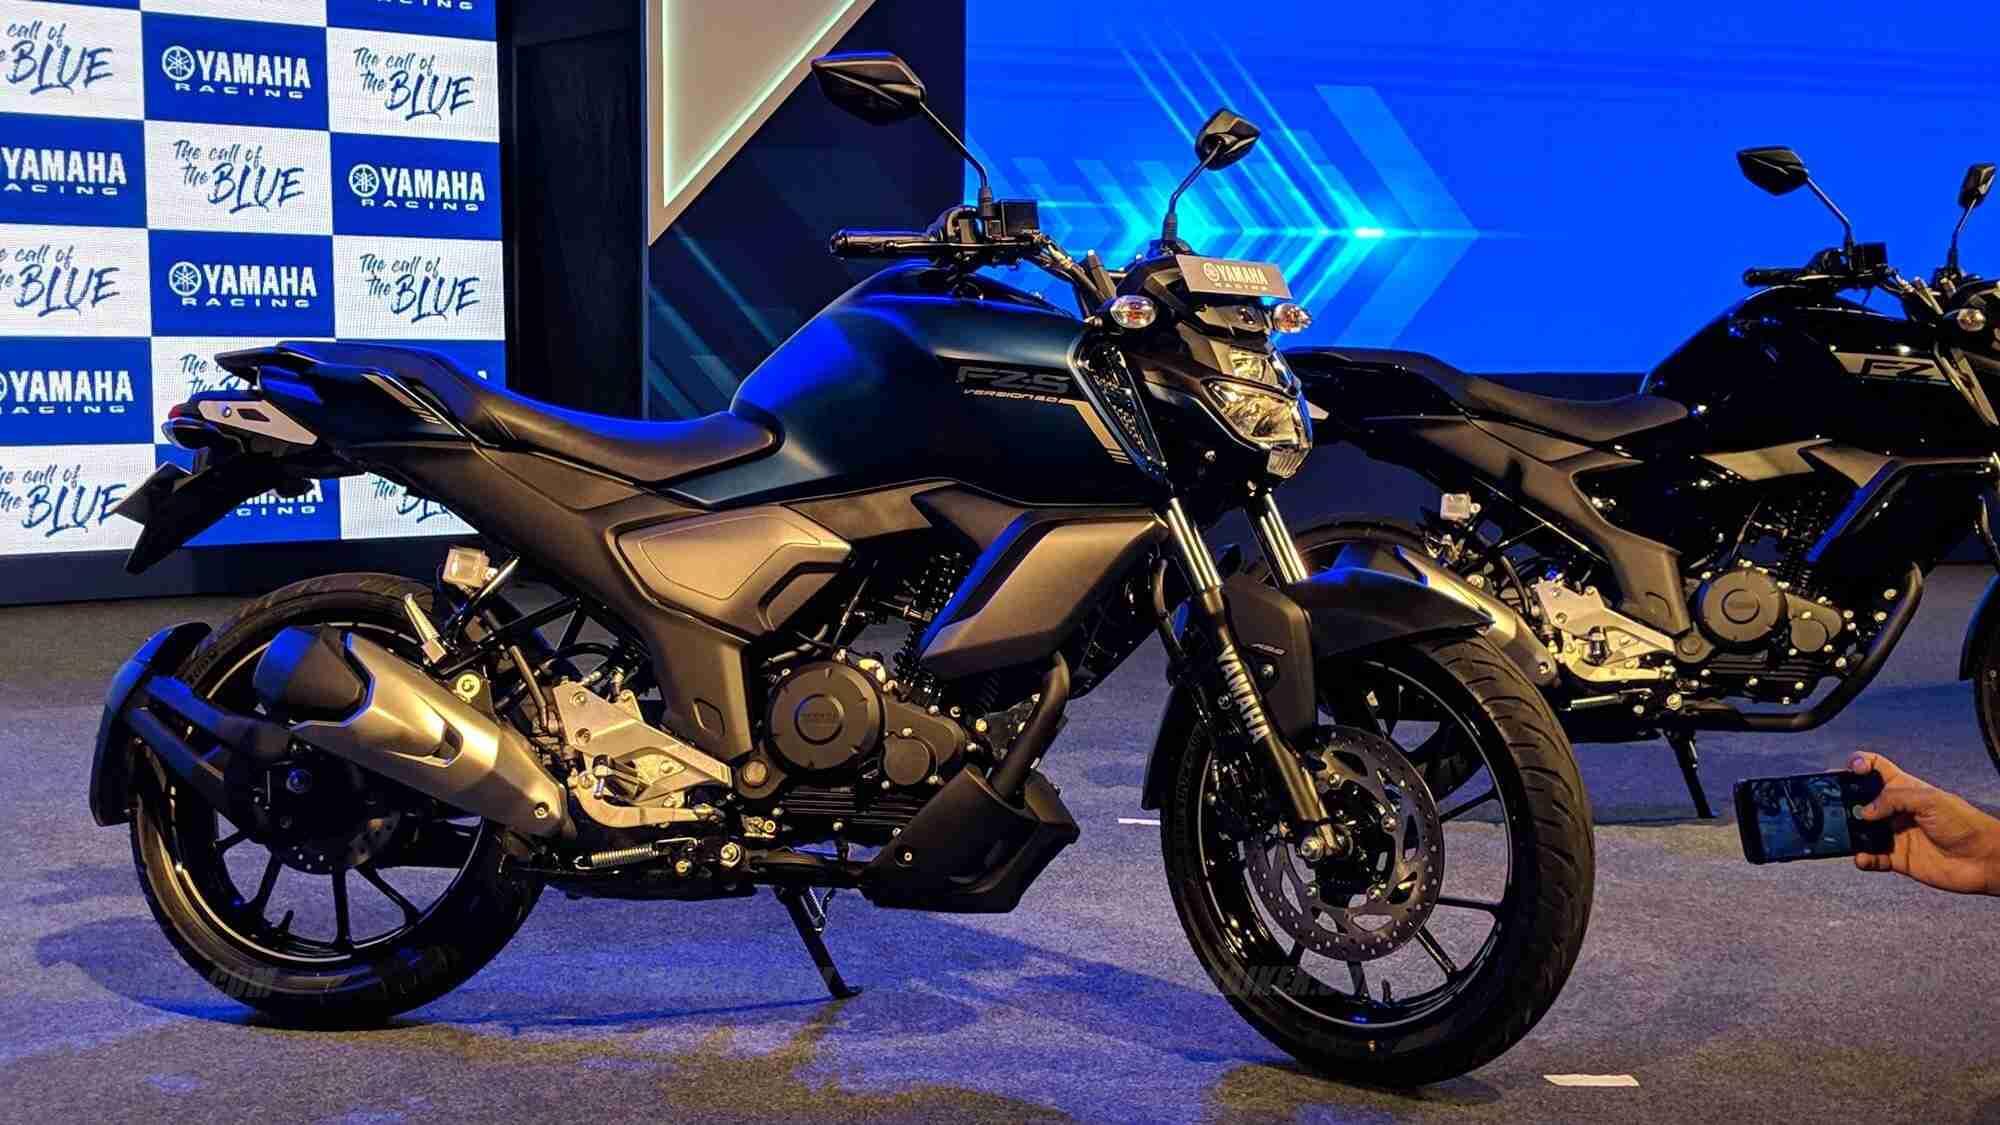 2019 Yamaha FZ V3.0 ABS Launched - RPM-Addiction